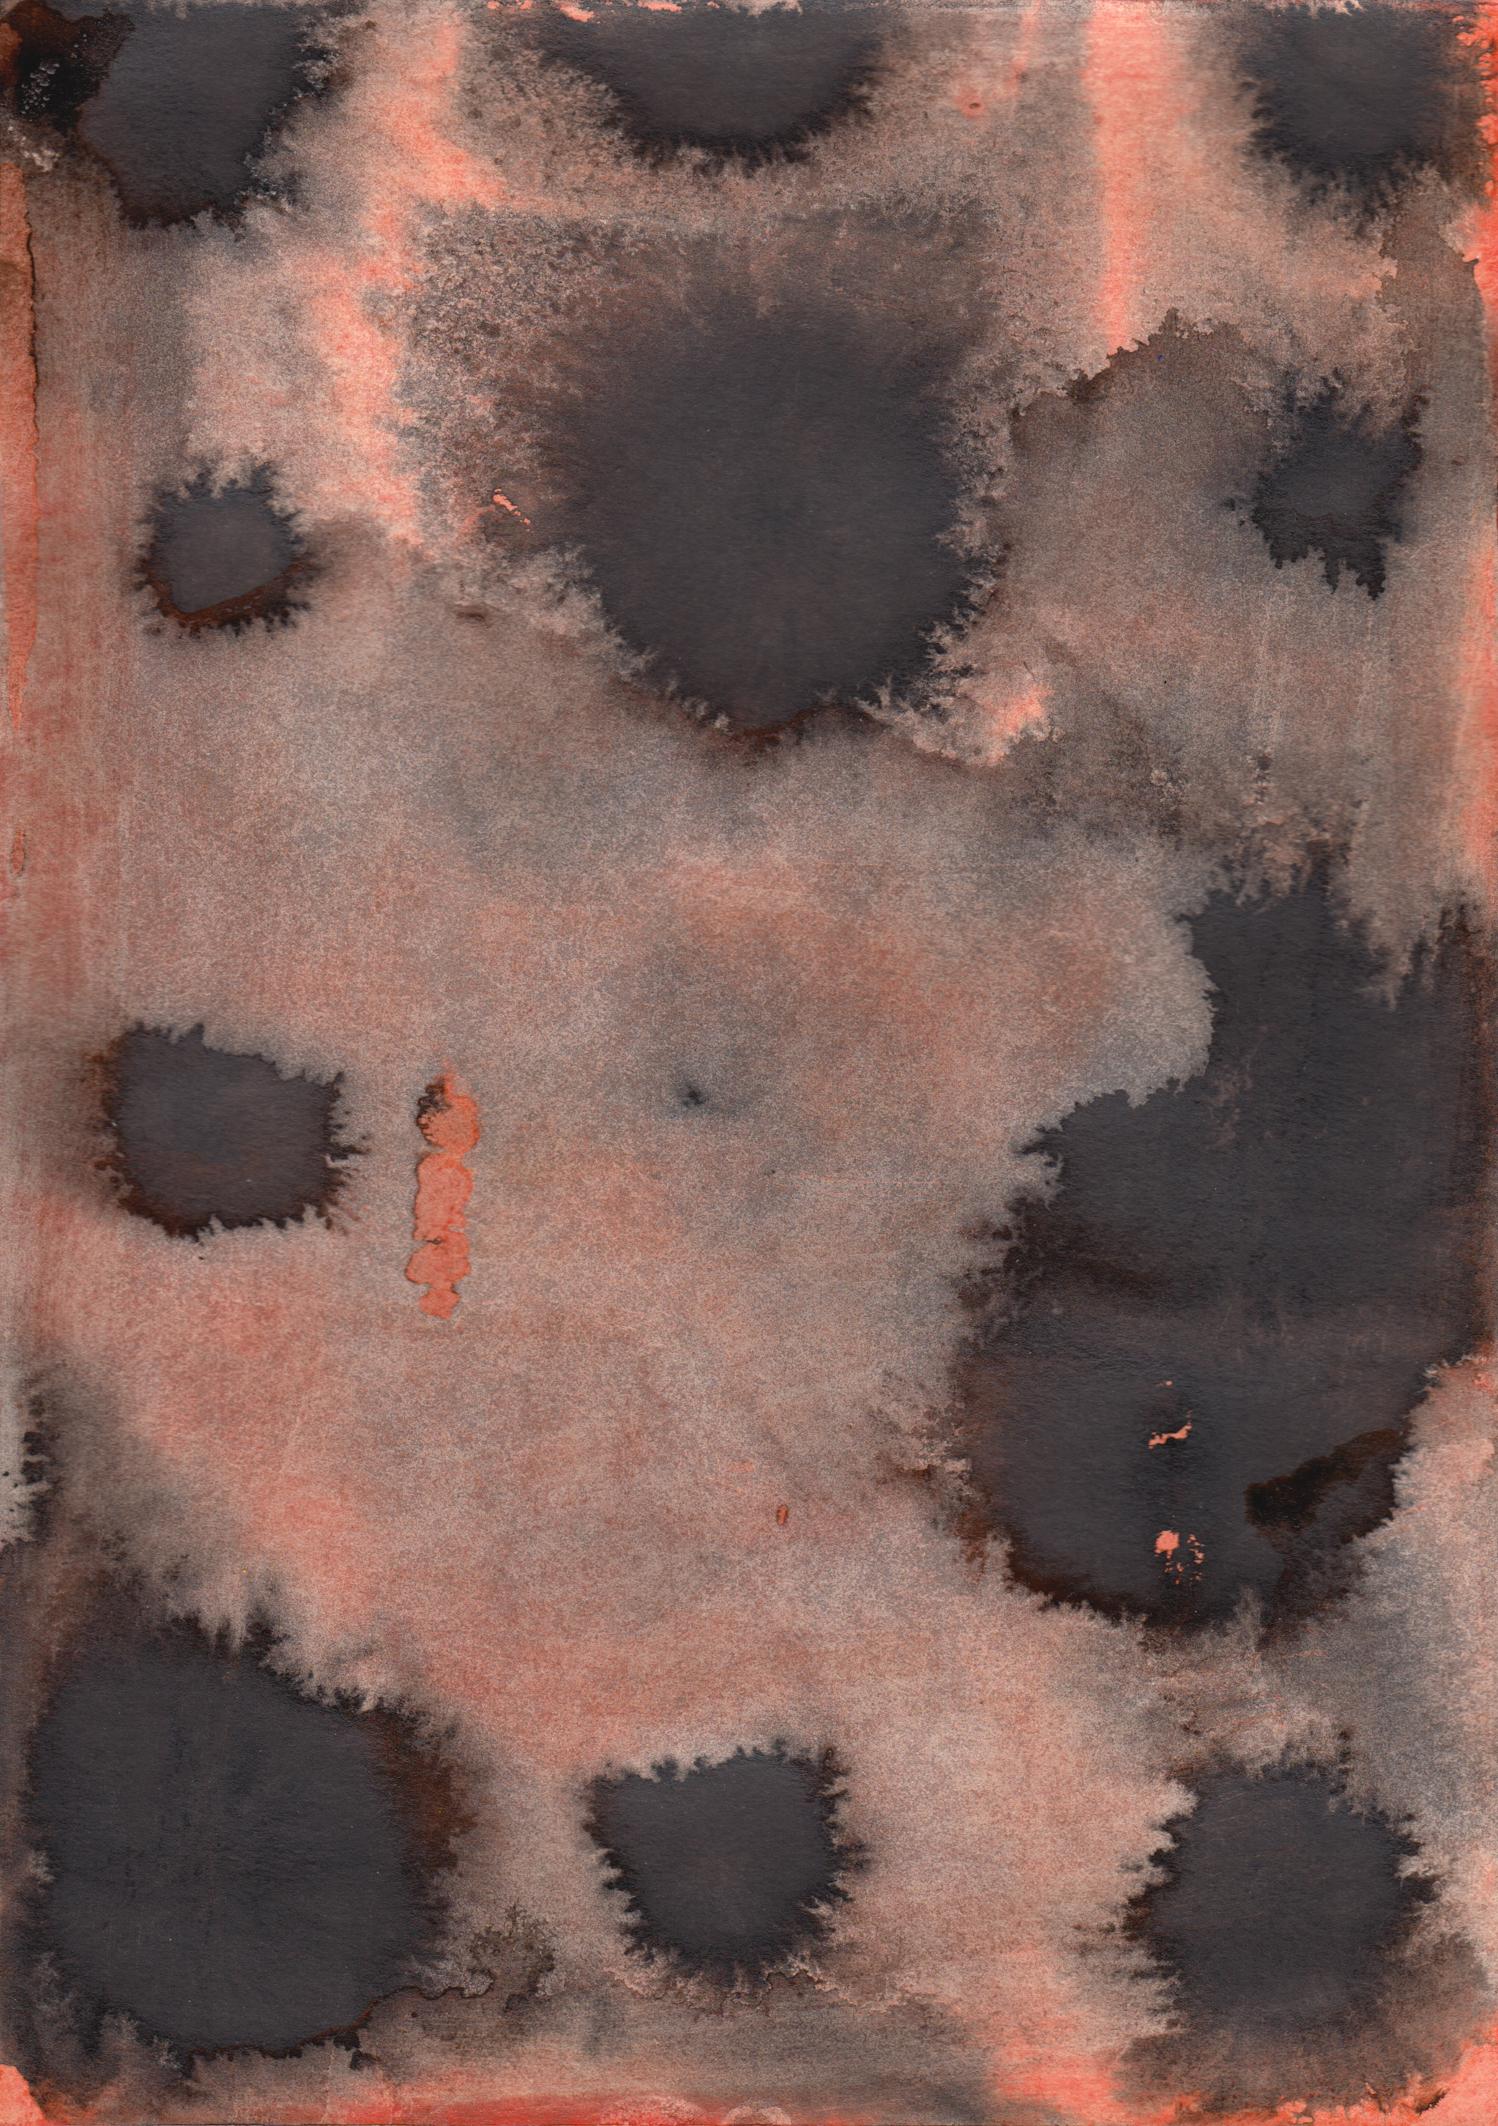 06-jana_morgenstern-14-6-17_iv-2017-acryl_tusche_auf_papier-29-7x21